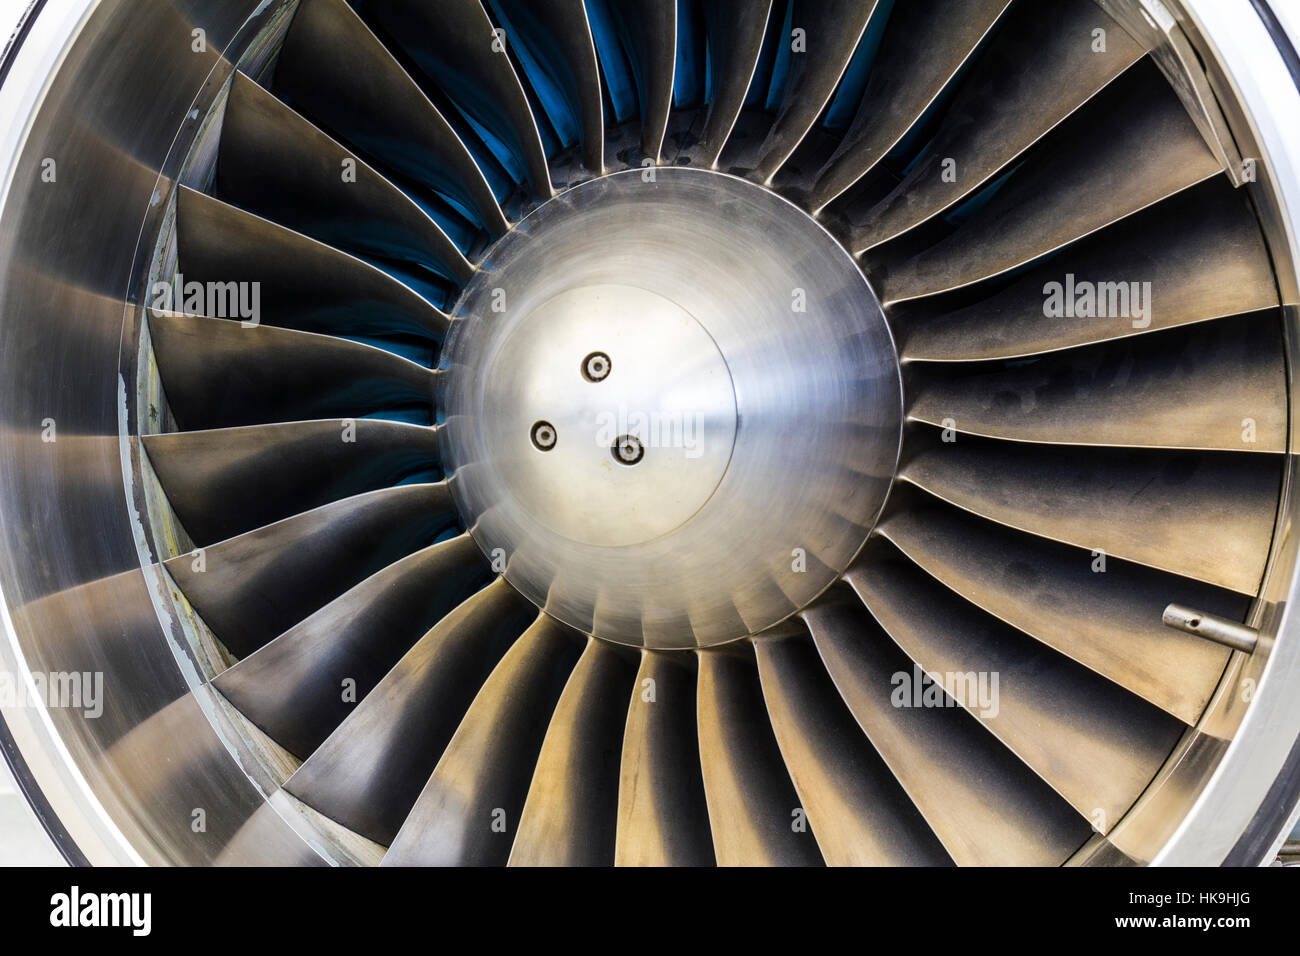 Turbine Blades of an Airplane Jet Engine I - Stock Image